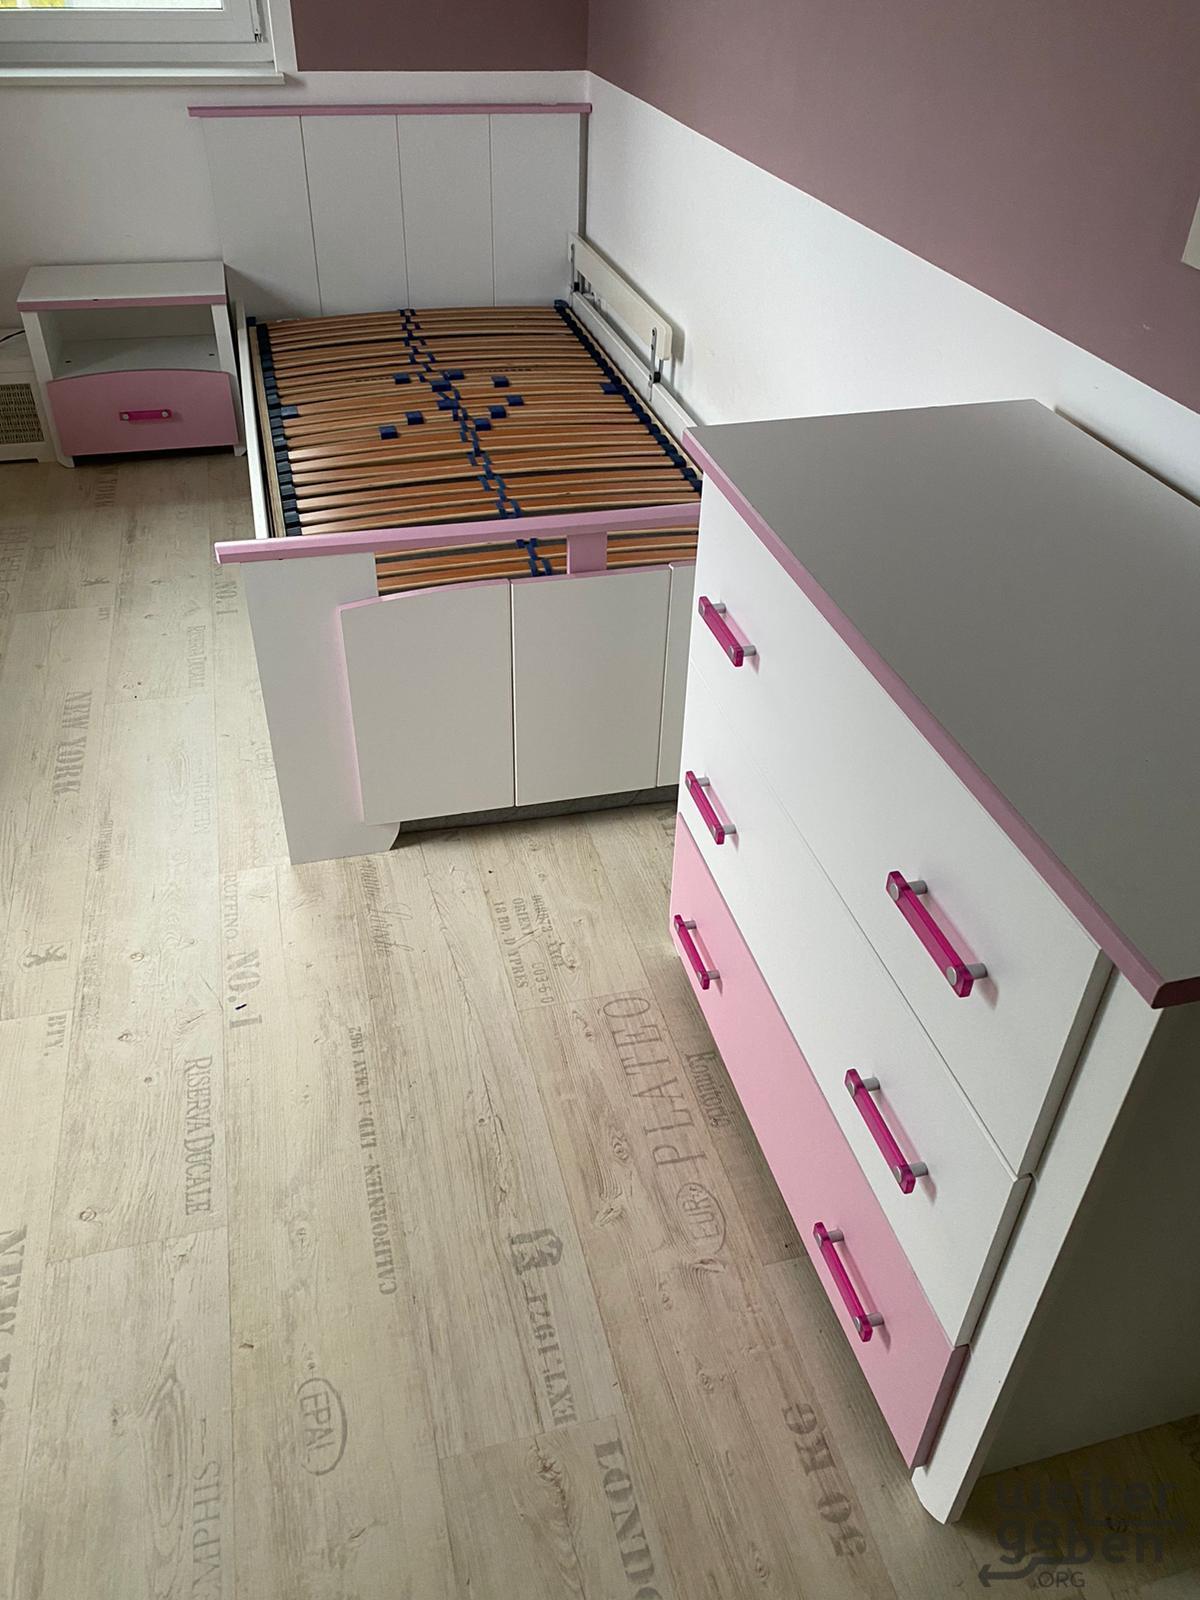 Bett Kommode Beistelltisch in Panketal